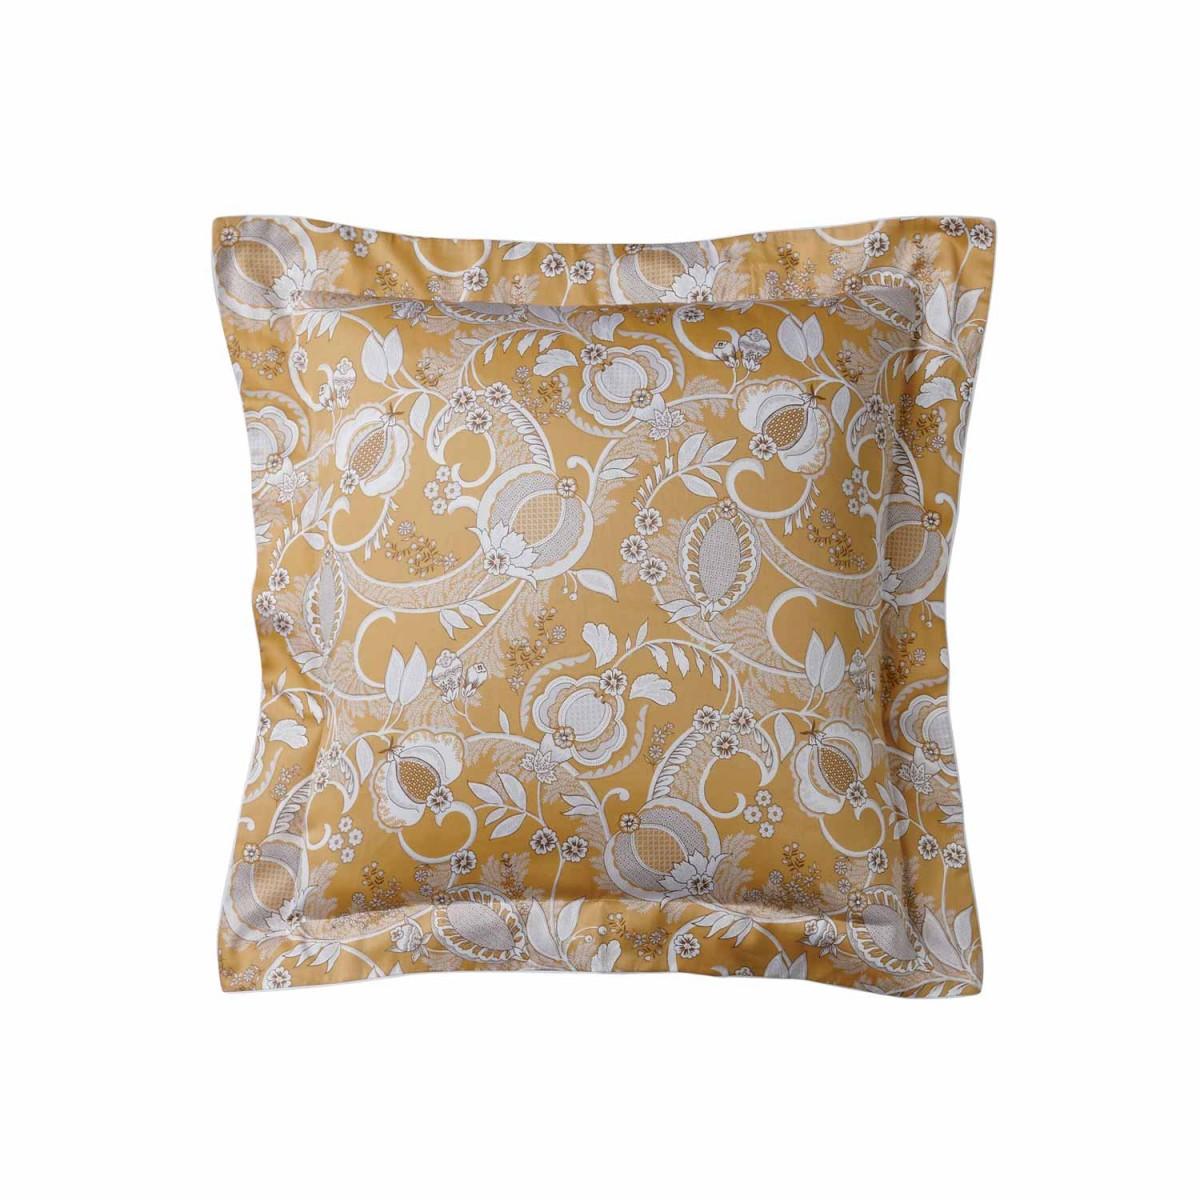 alexandre-turpault-taie-oreiller-carree-jaune-haut-de-gamme-satin-coton-mogador